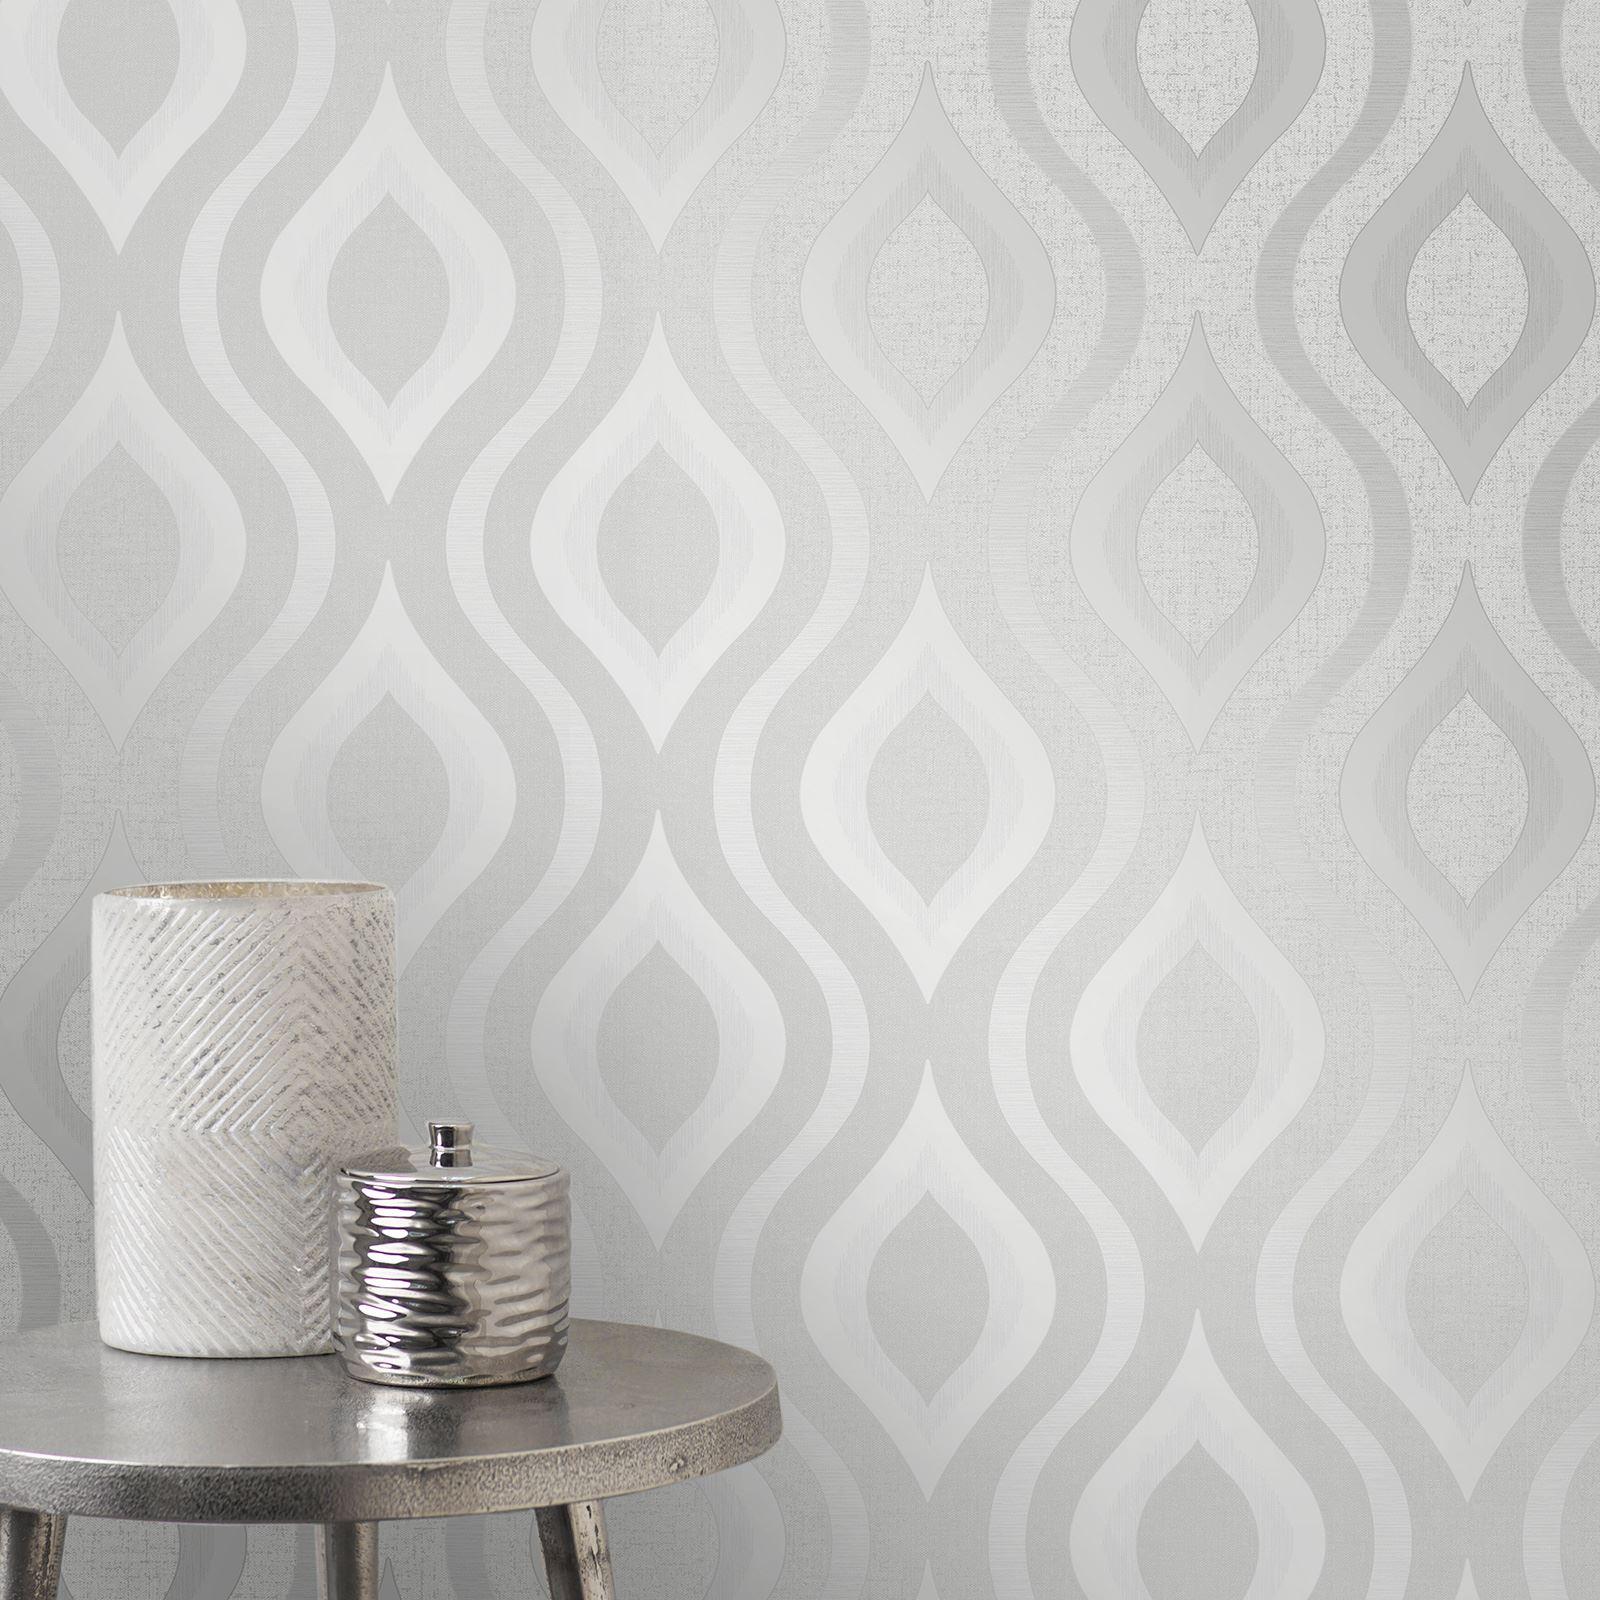 quarz geometrische tapeten silber feine dekor fd41968. Black Bedroom Furniture Sets. Home Design Ideas